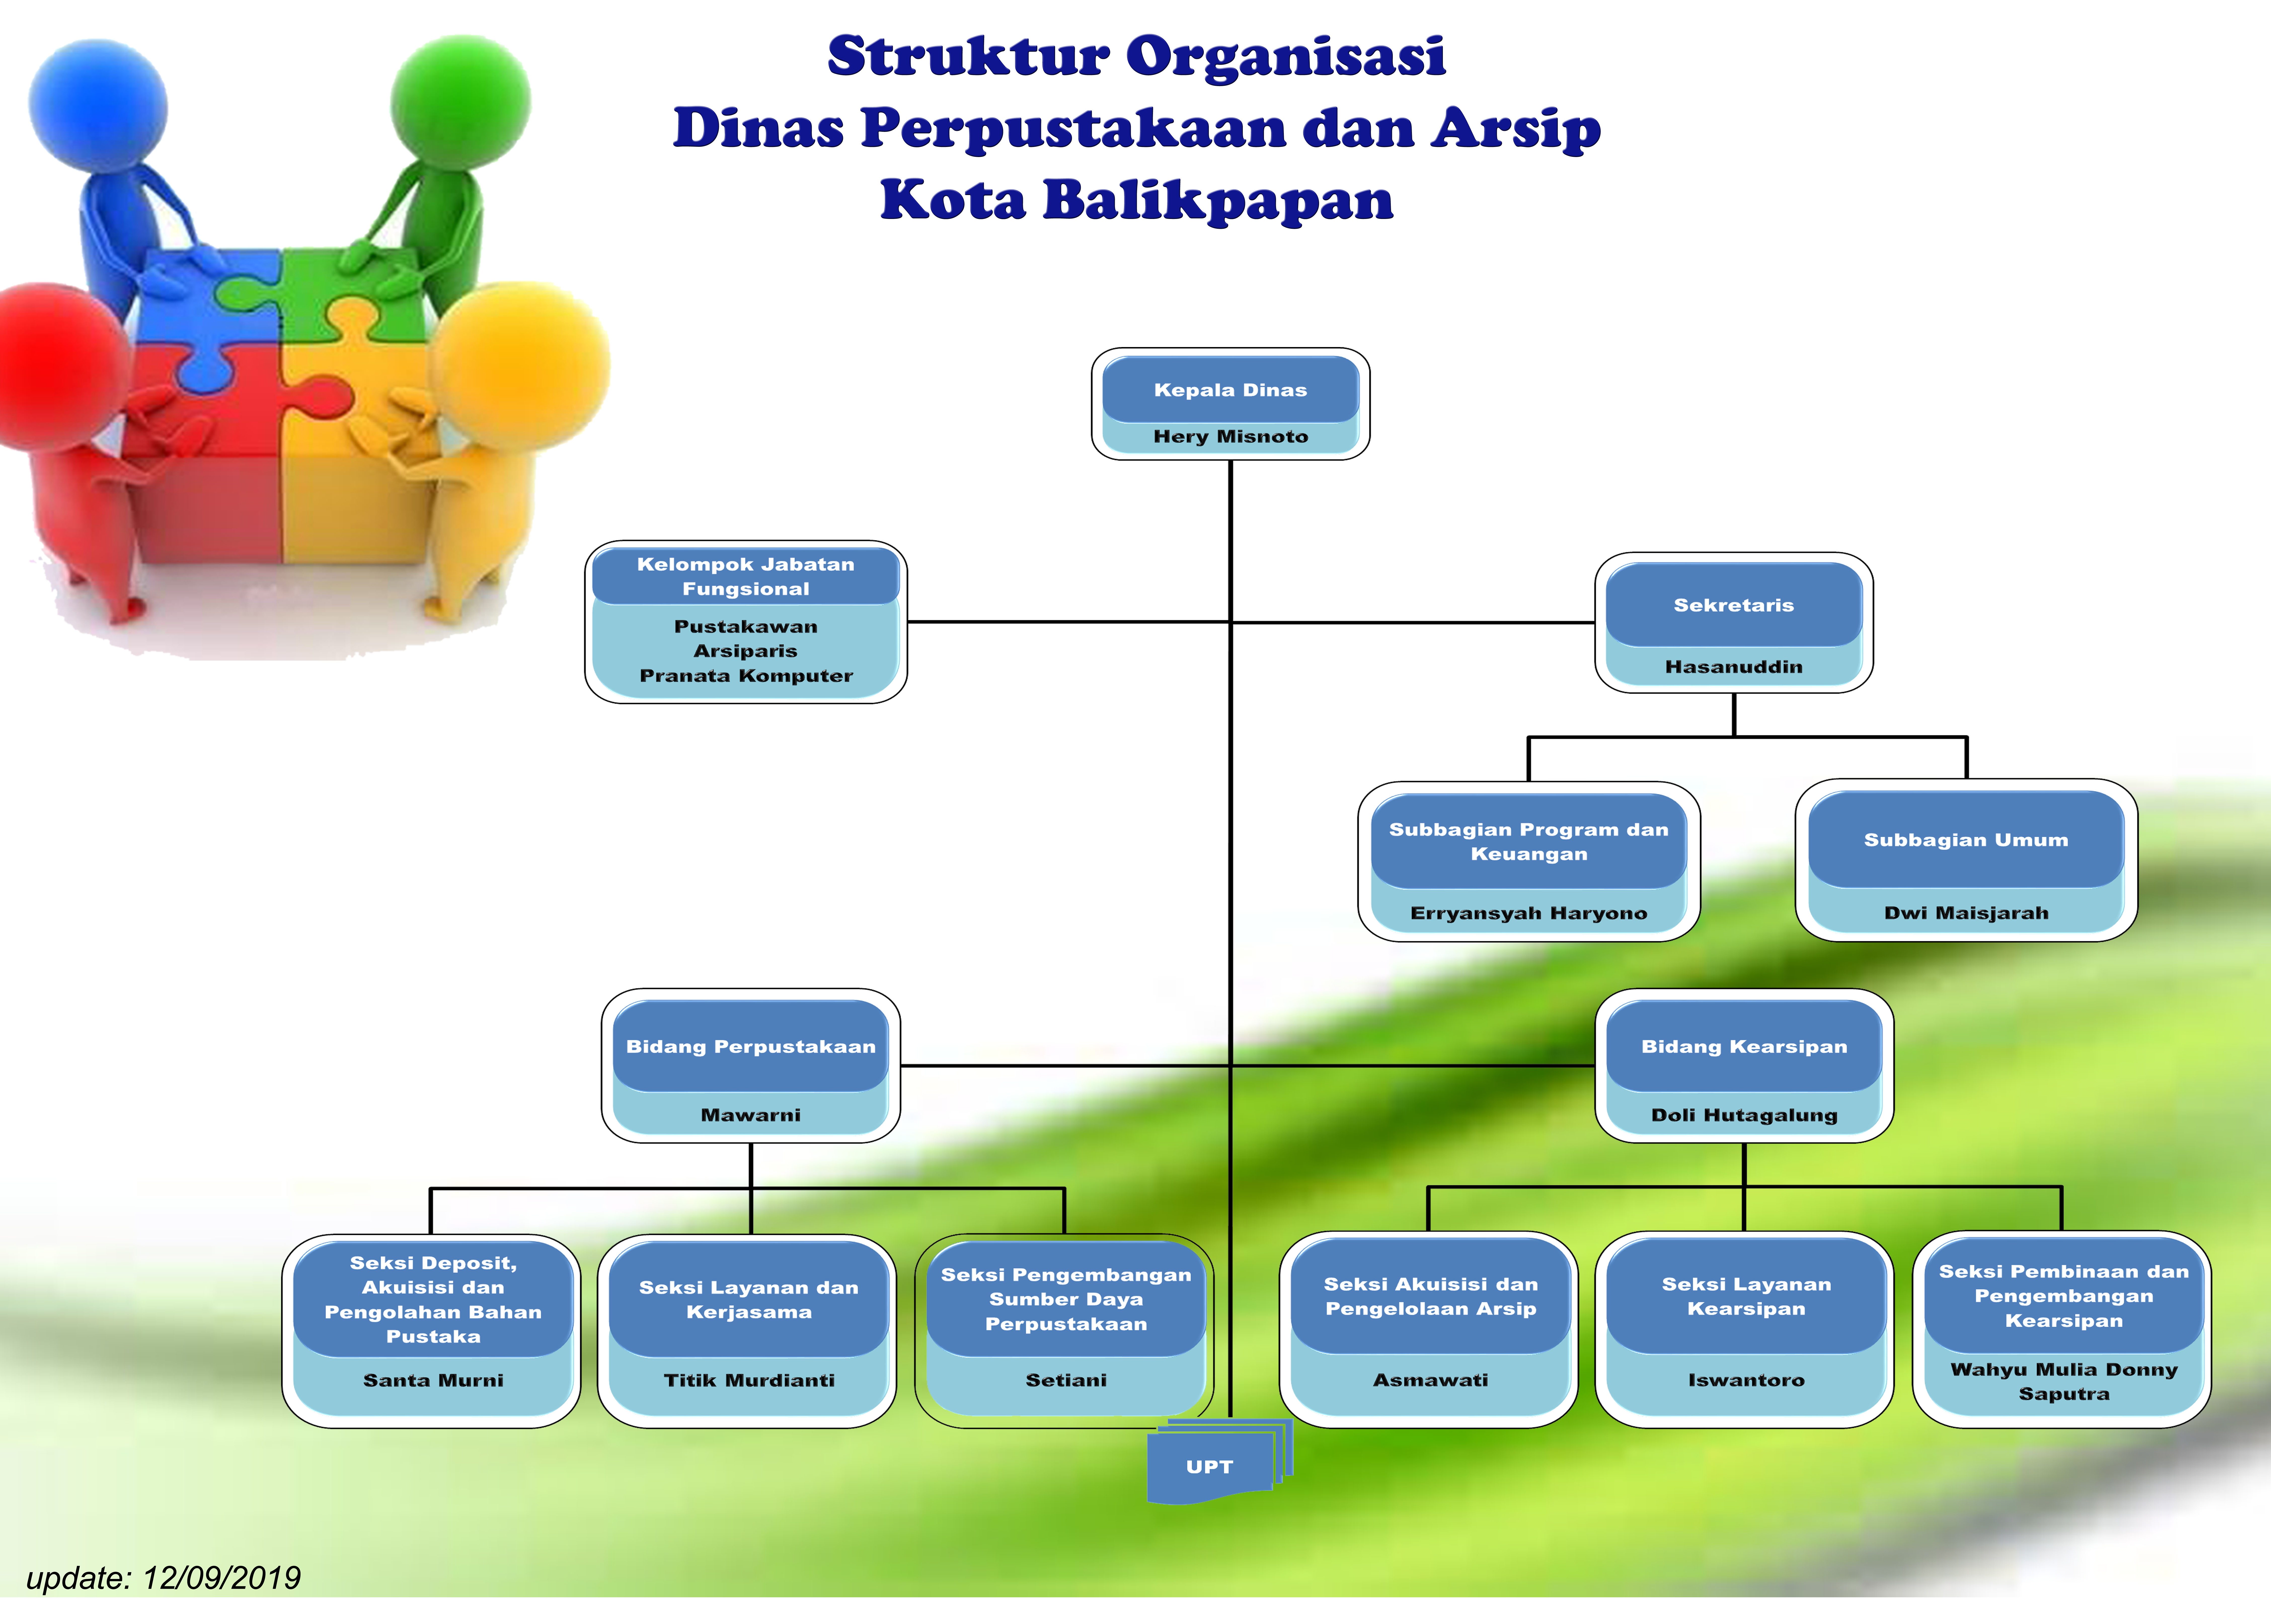 Struktur Organisasi Dispustakar Balikpapan